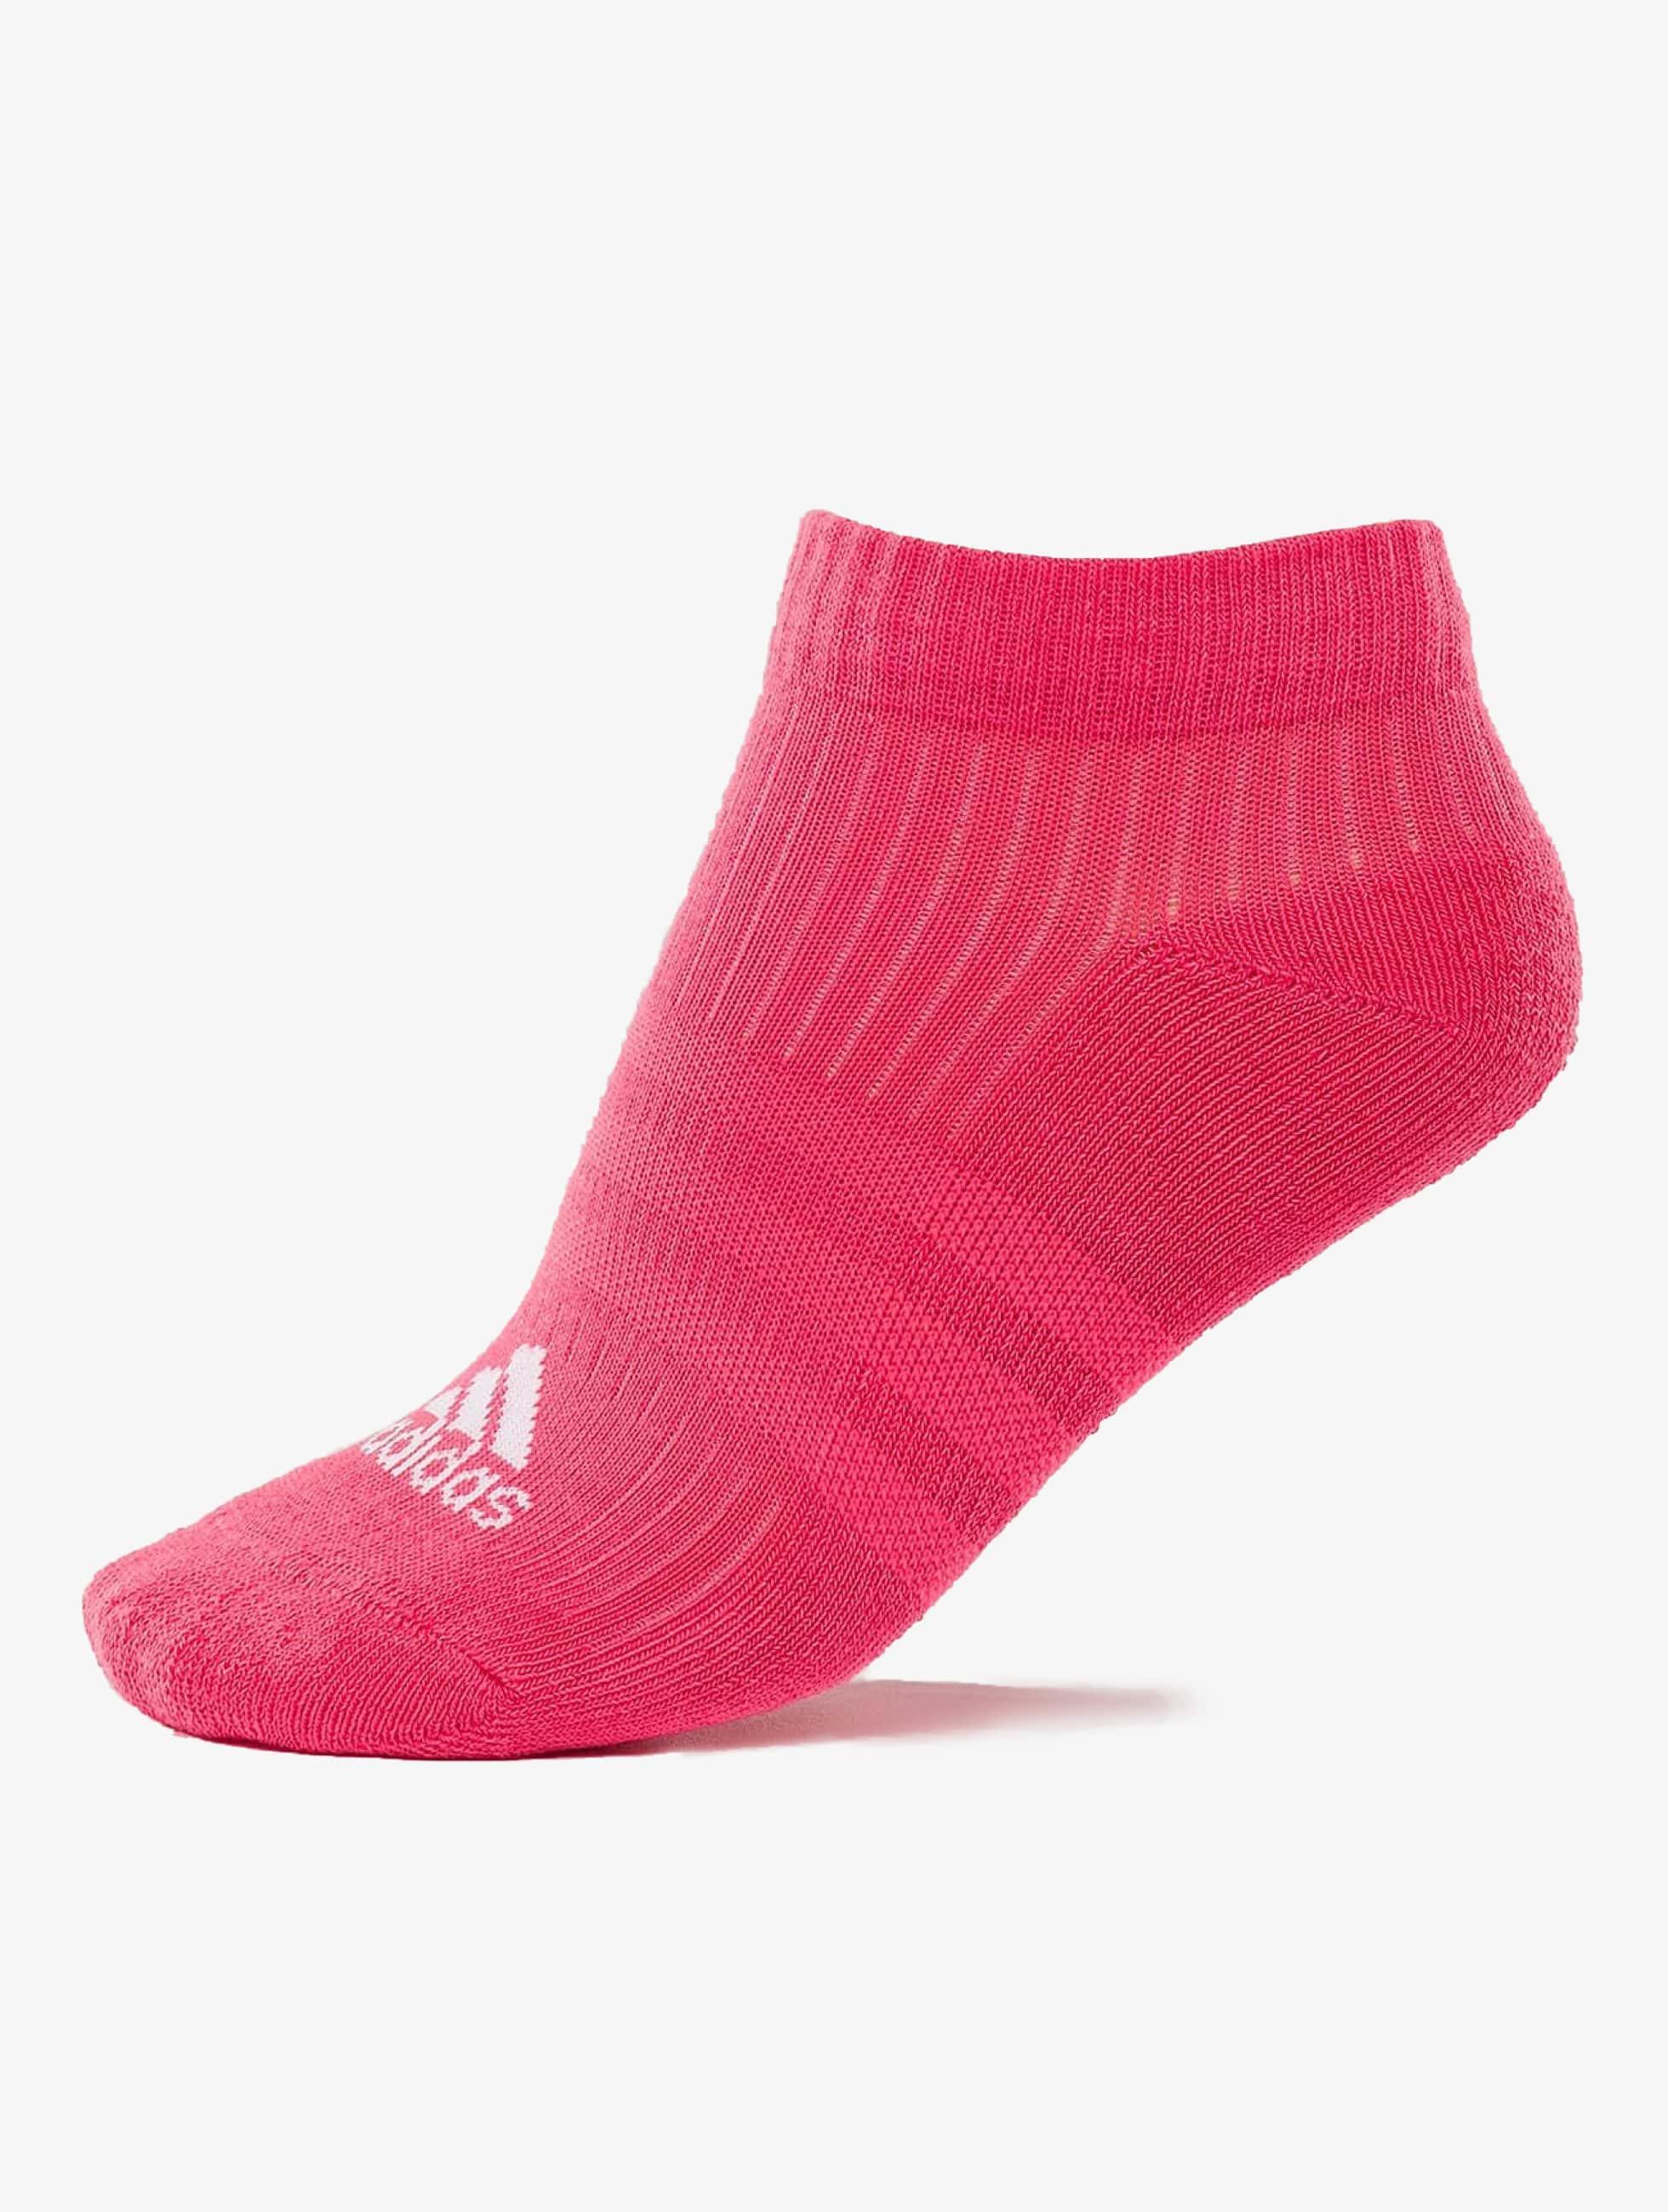 adidas originals Socks 3-Stripes Per n-s HS 3-Pairs pink